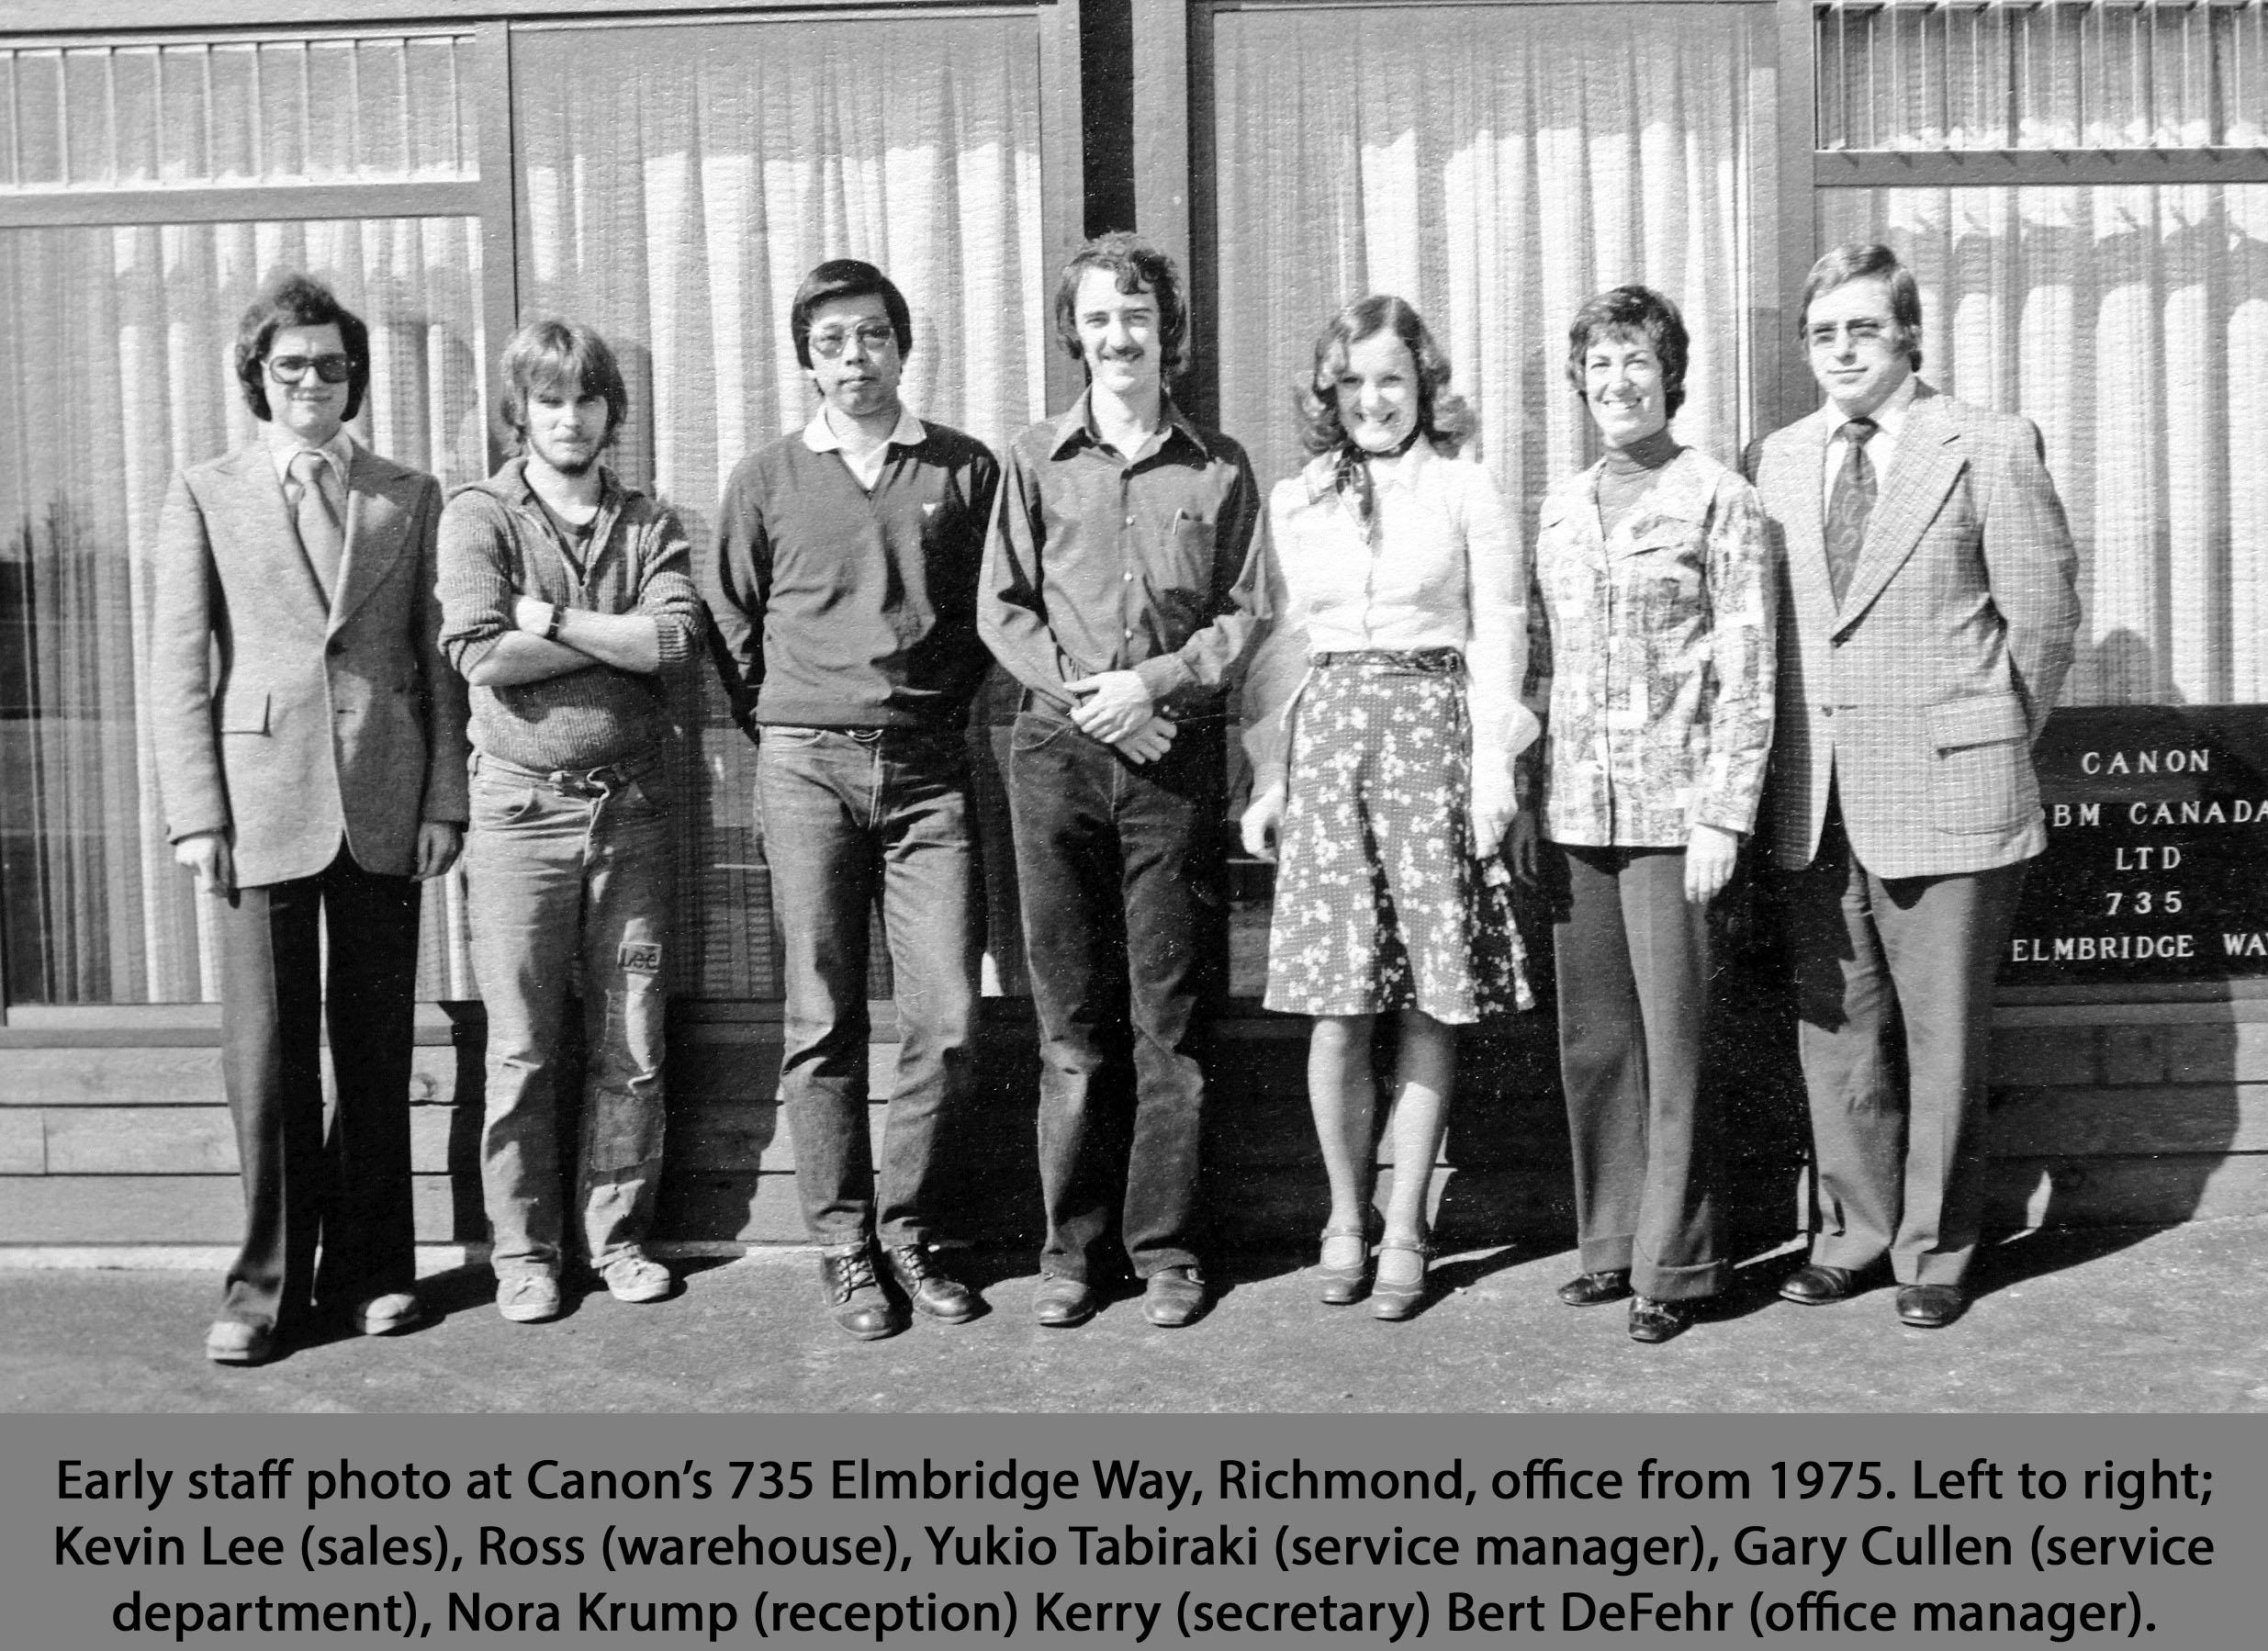 _MG_9125 canon obm staff 1975 wix